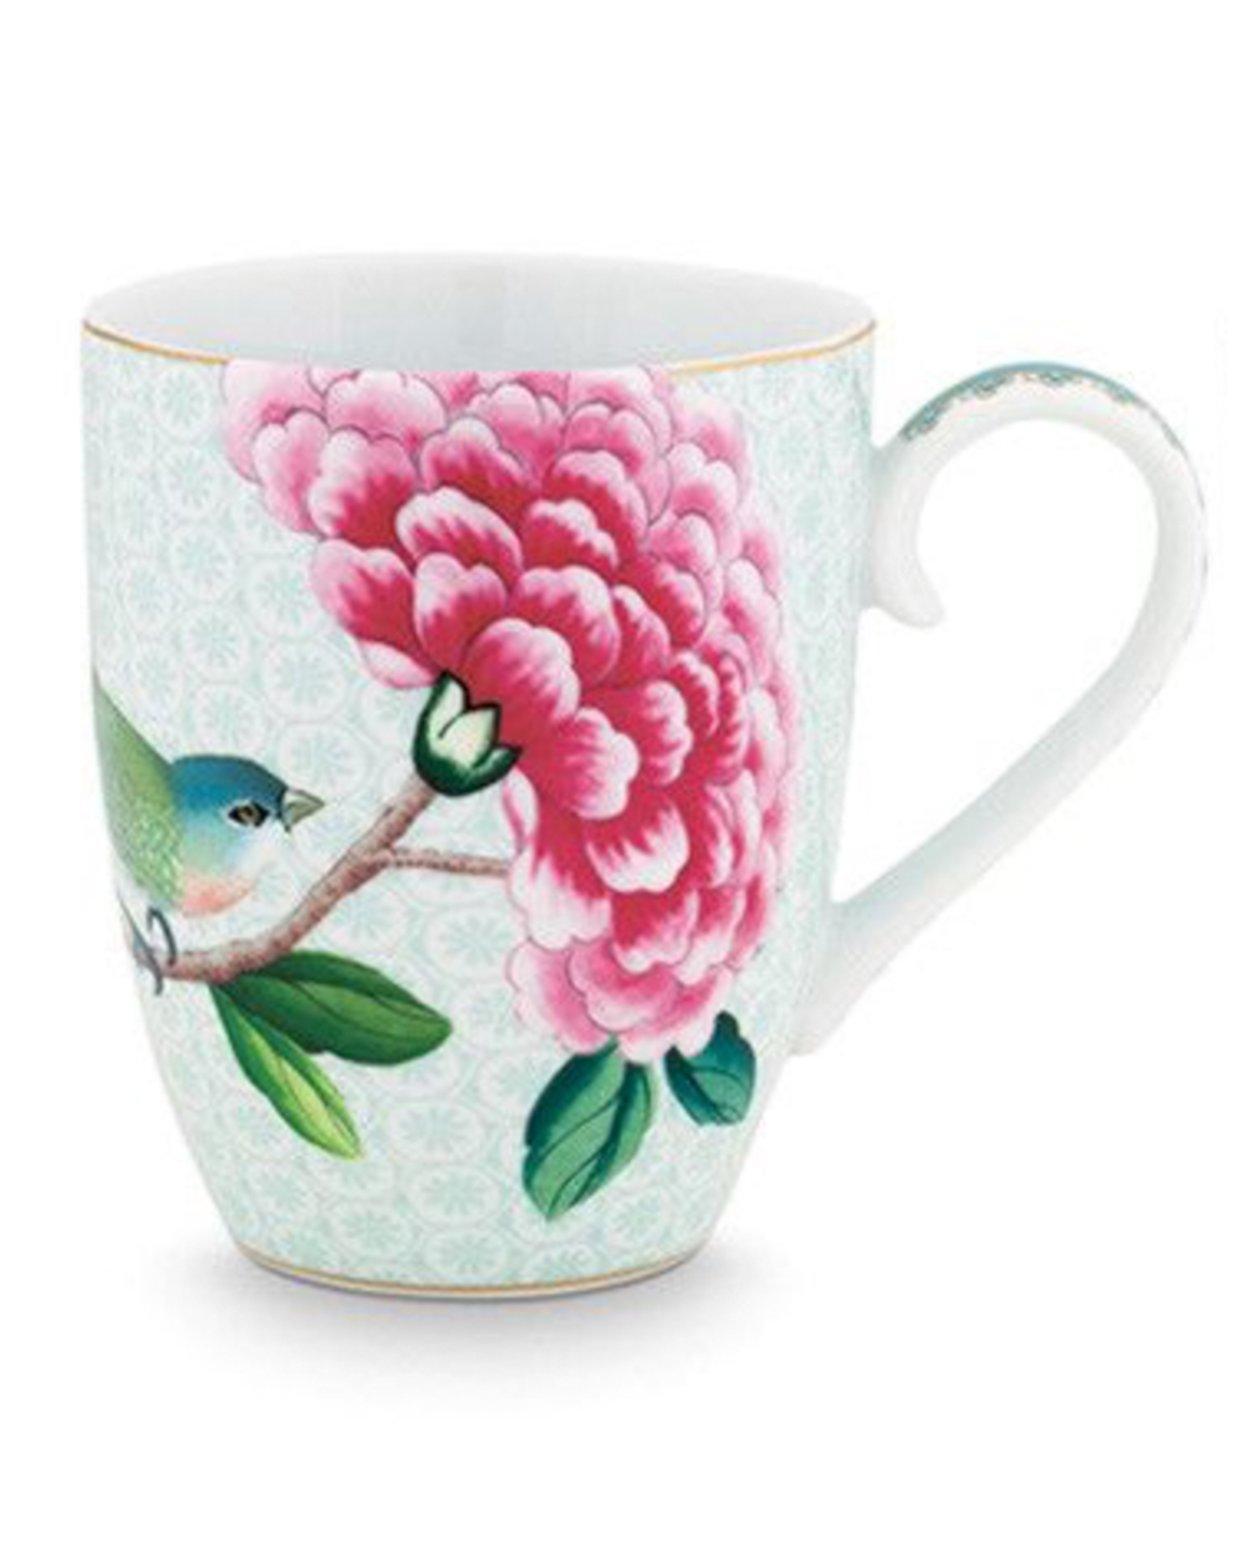 Blushing Birds Mug - White - Large